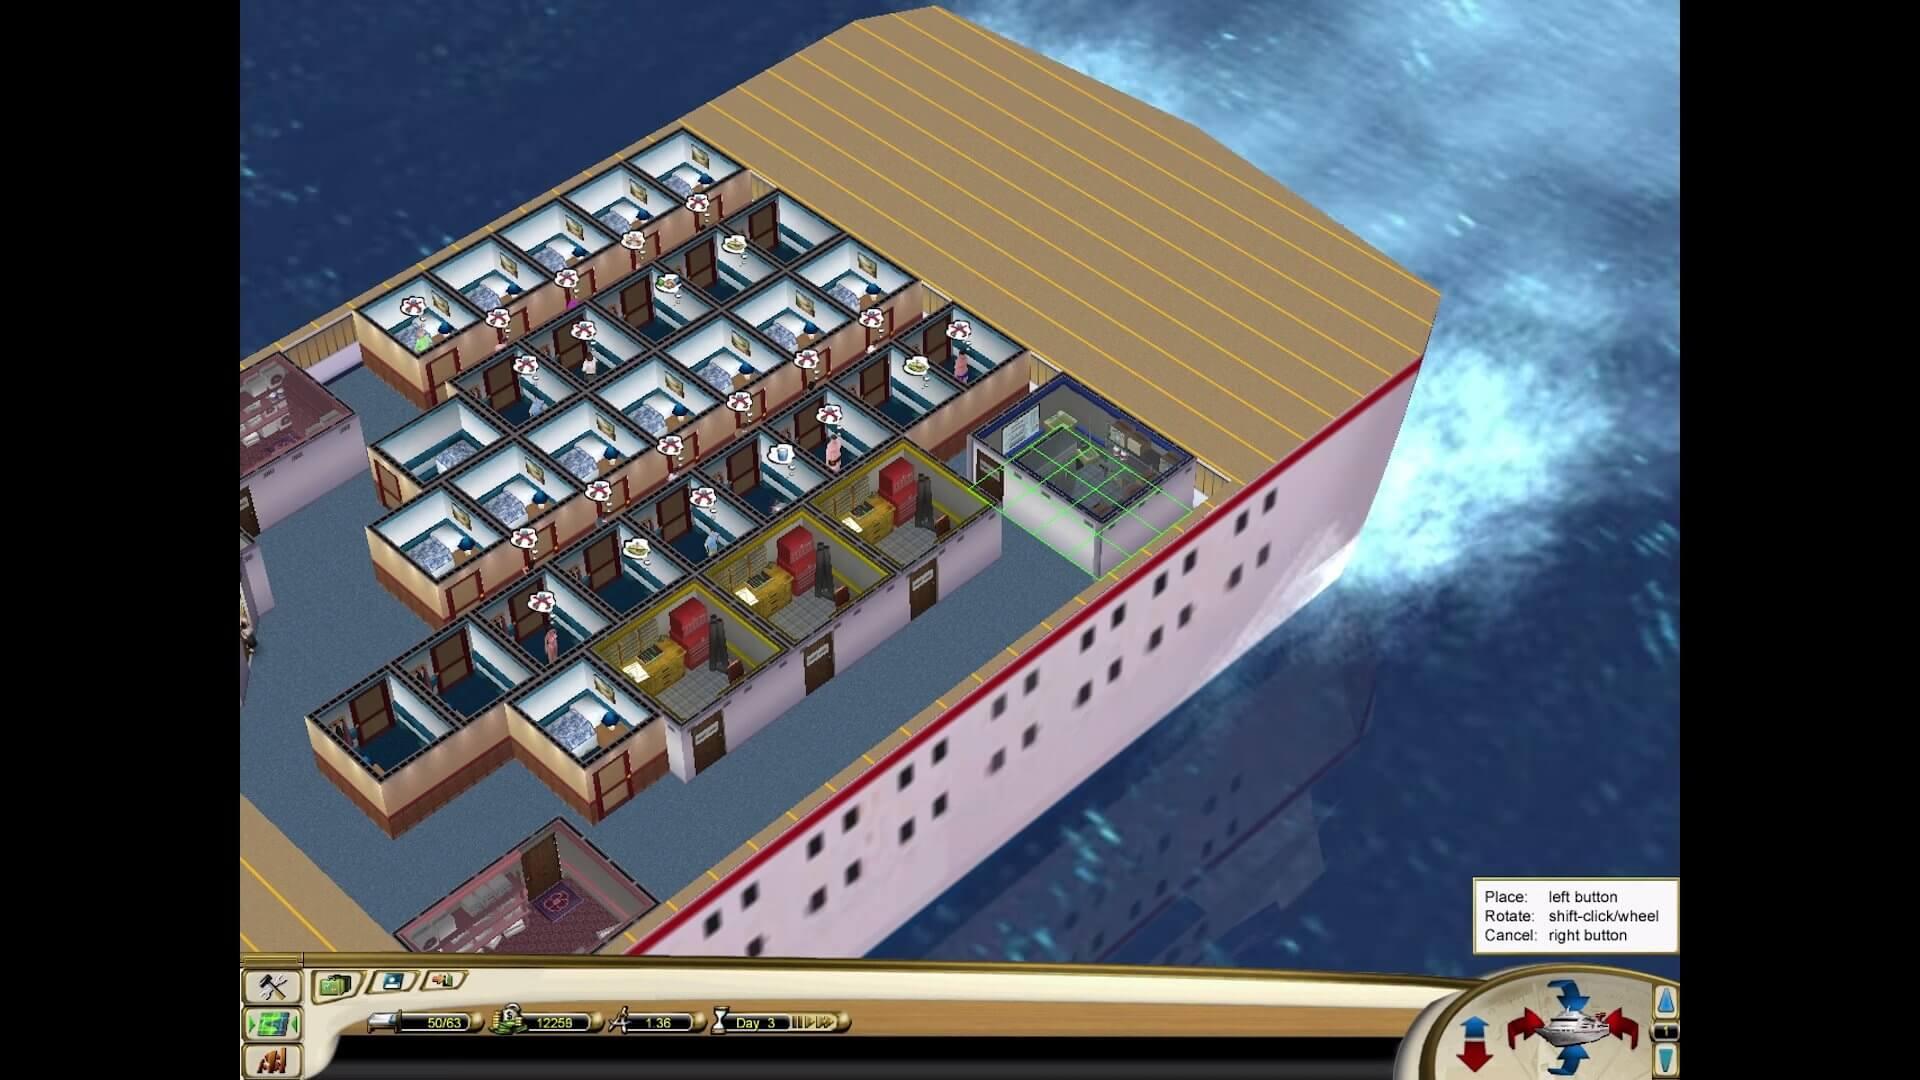 CARNIVAL SHIP TYCOON SCARICA